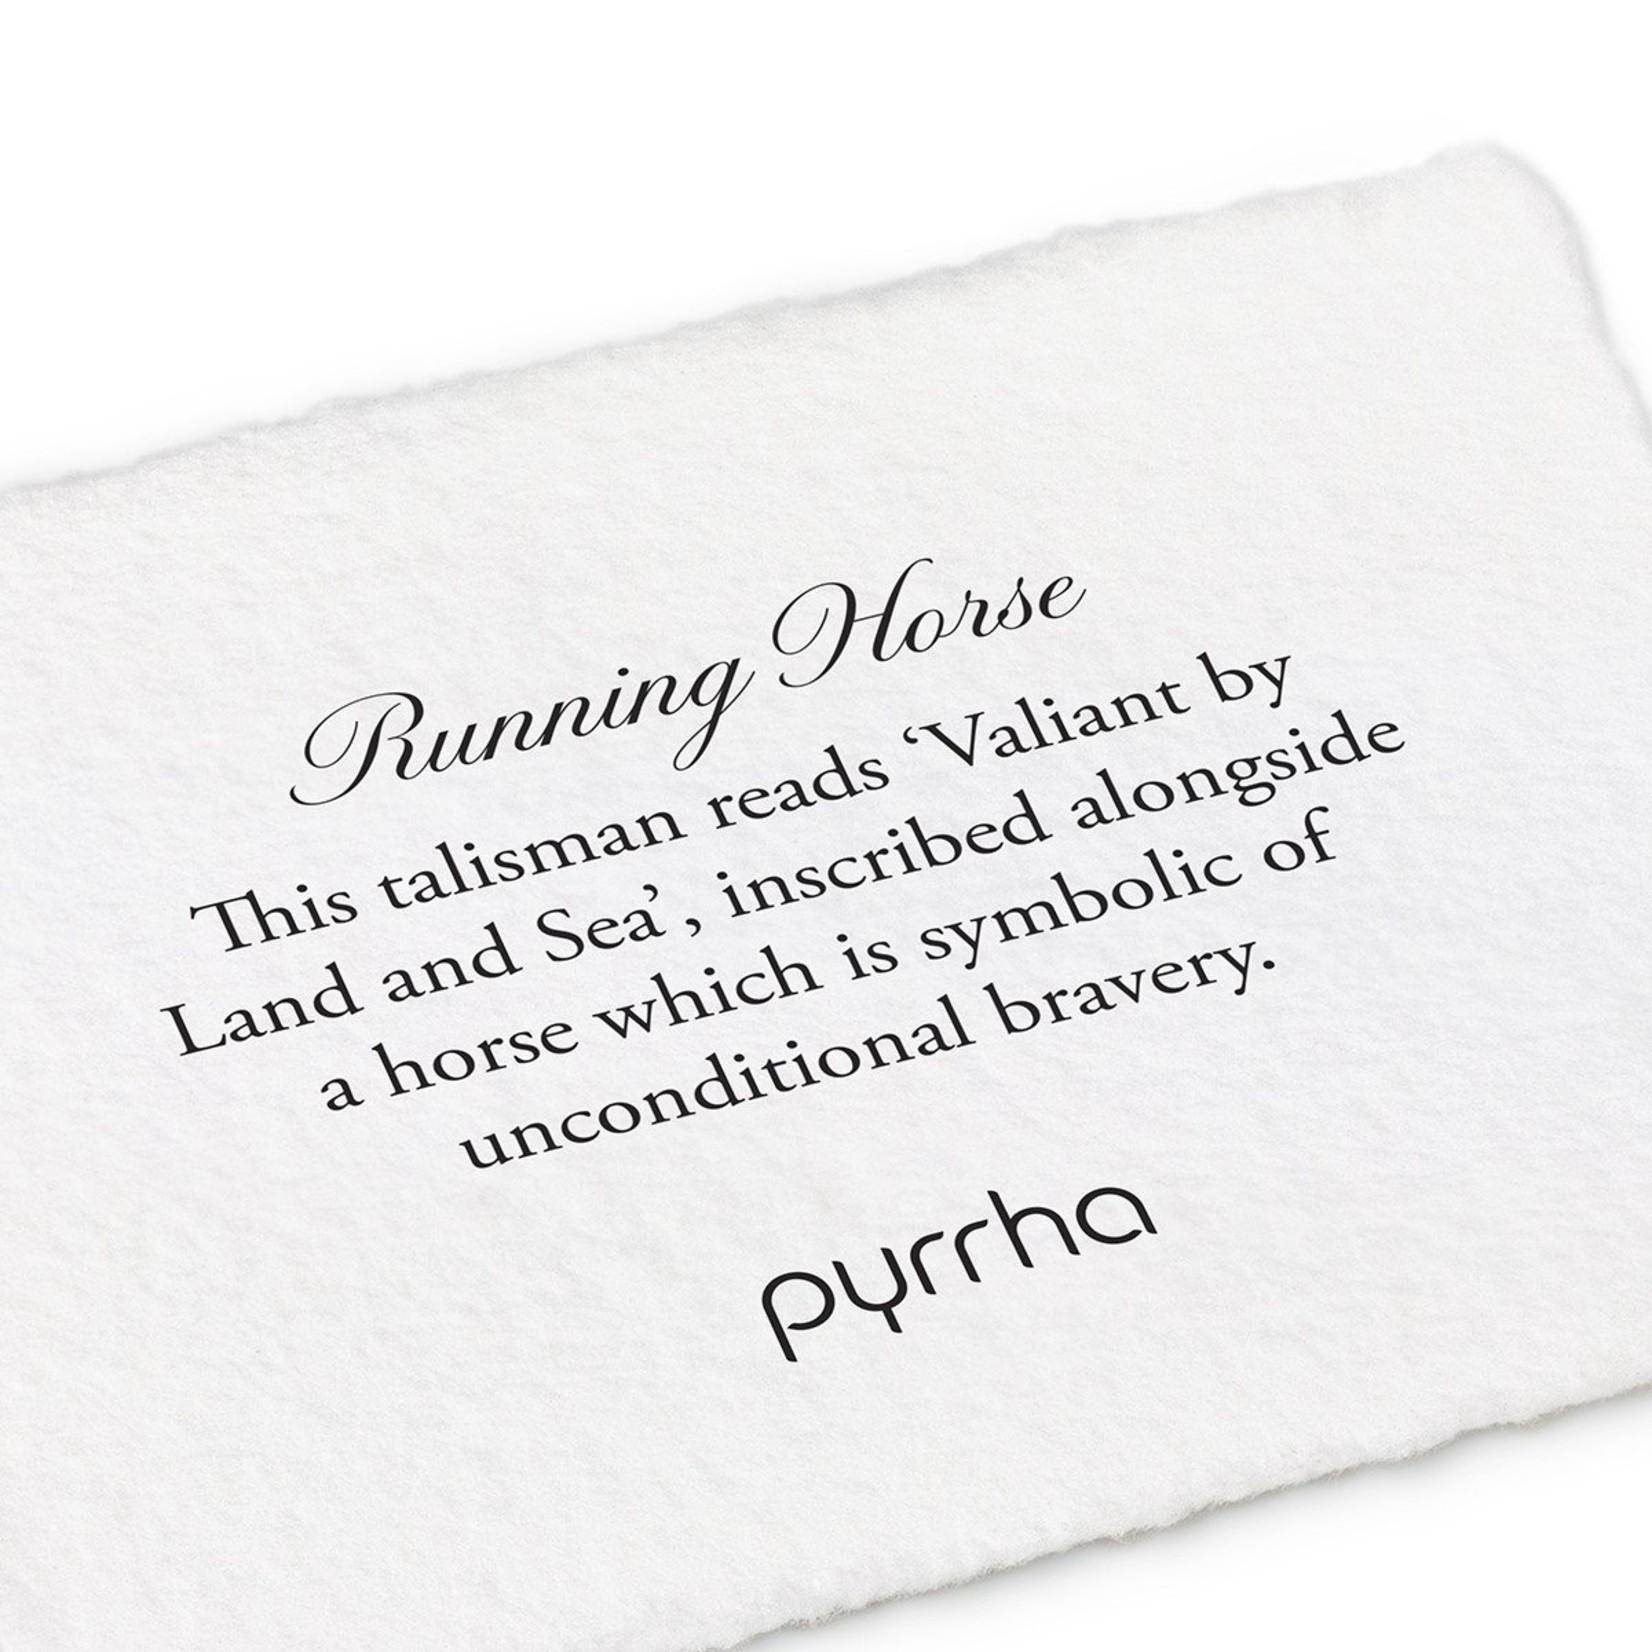 Pyrrha Running Horse Signature Talisman